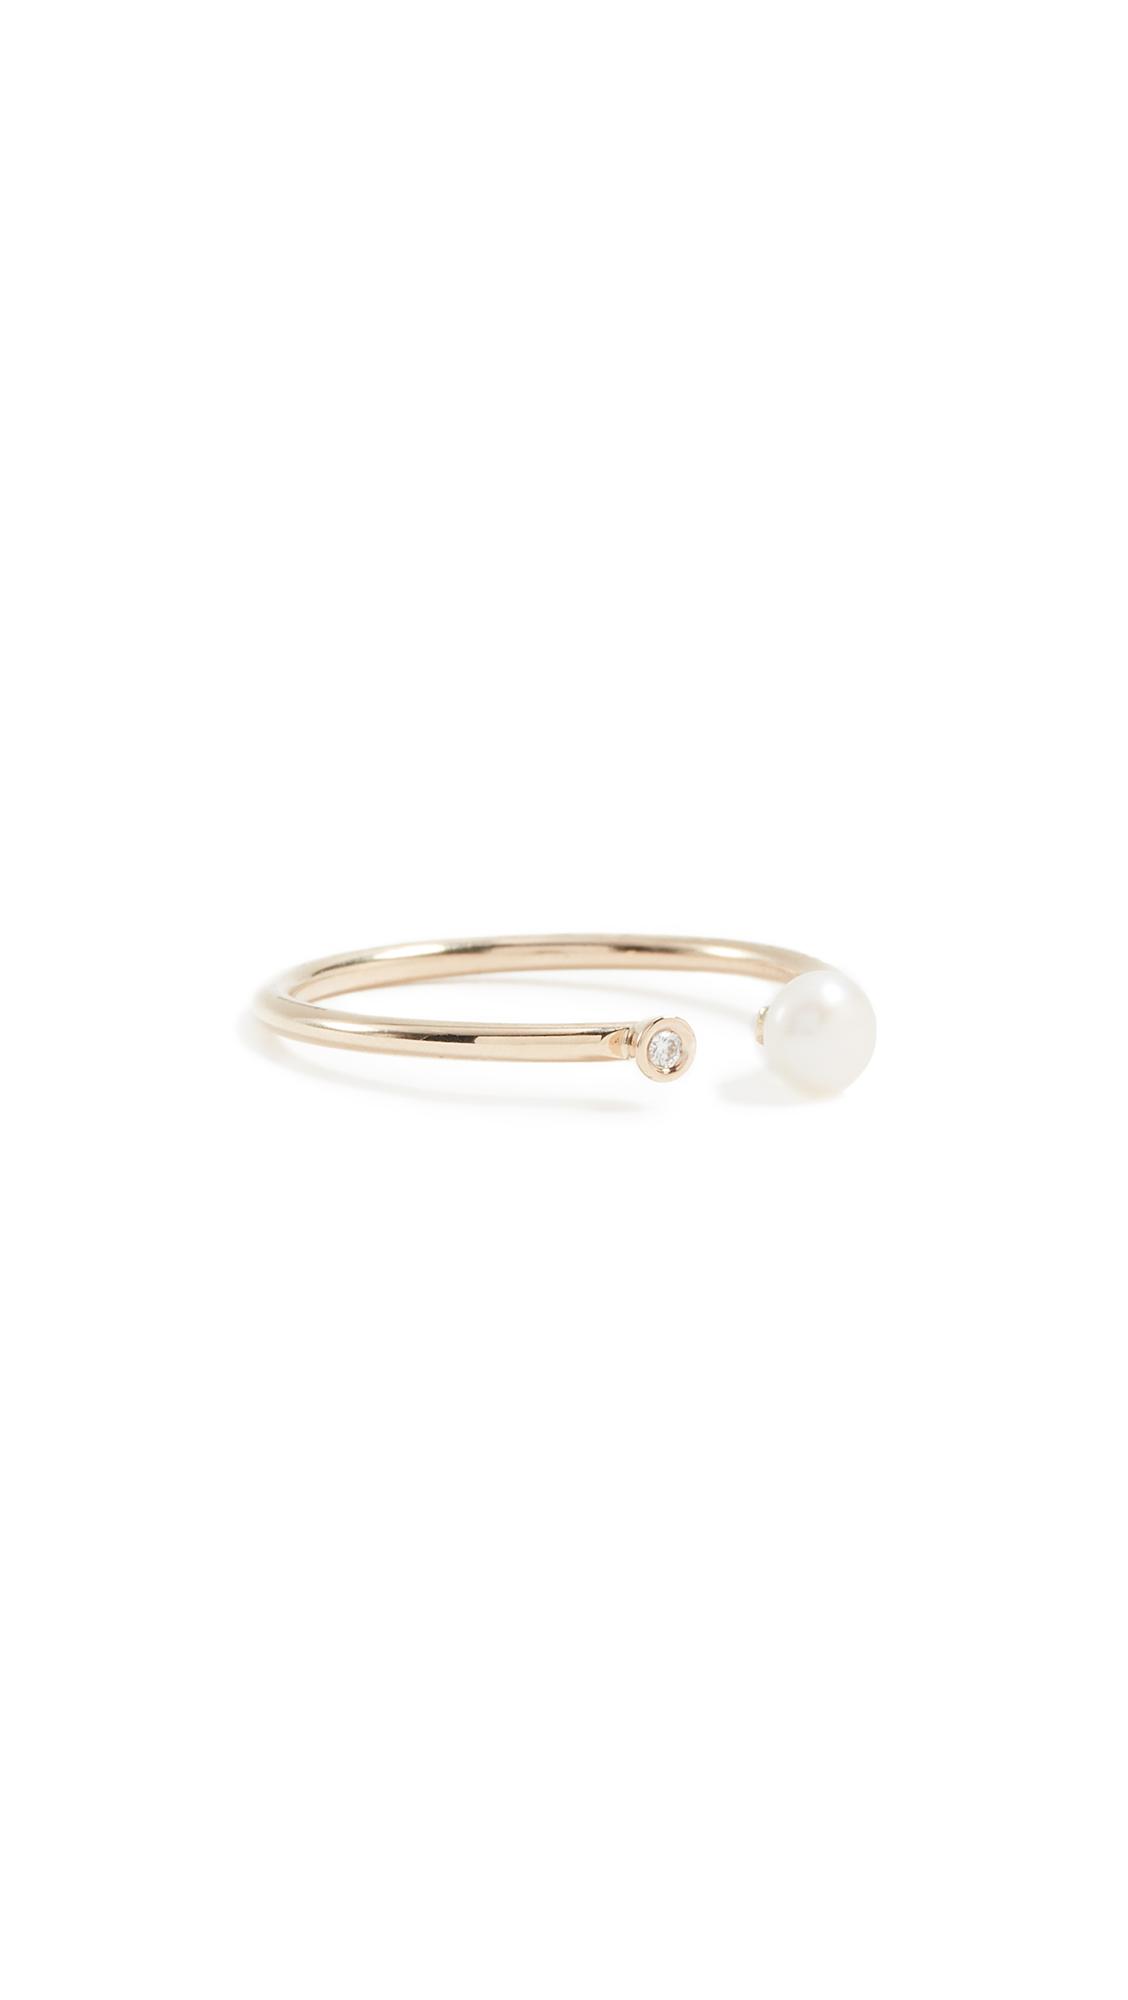 ARIEL GORDON JEWELRY PEARL & DIAMOND RING